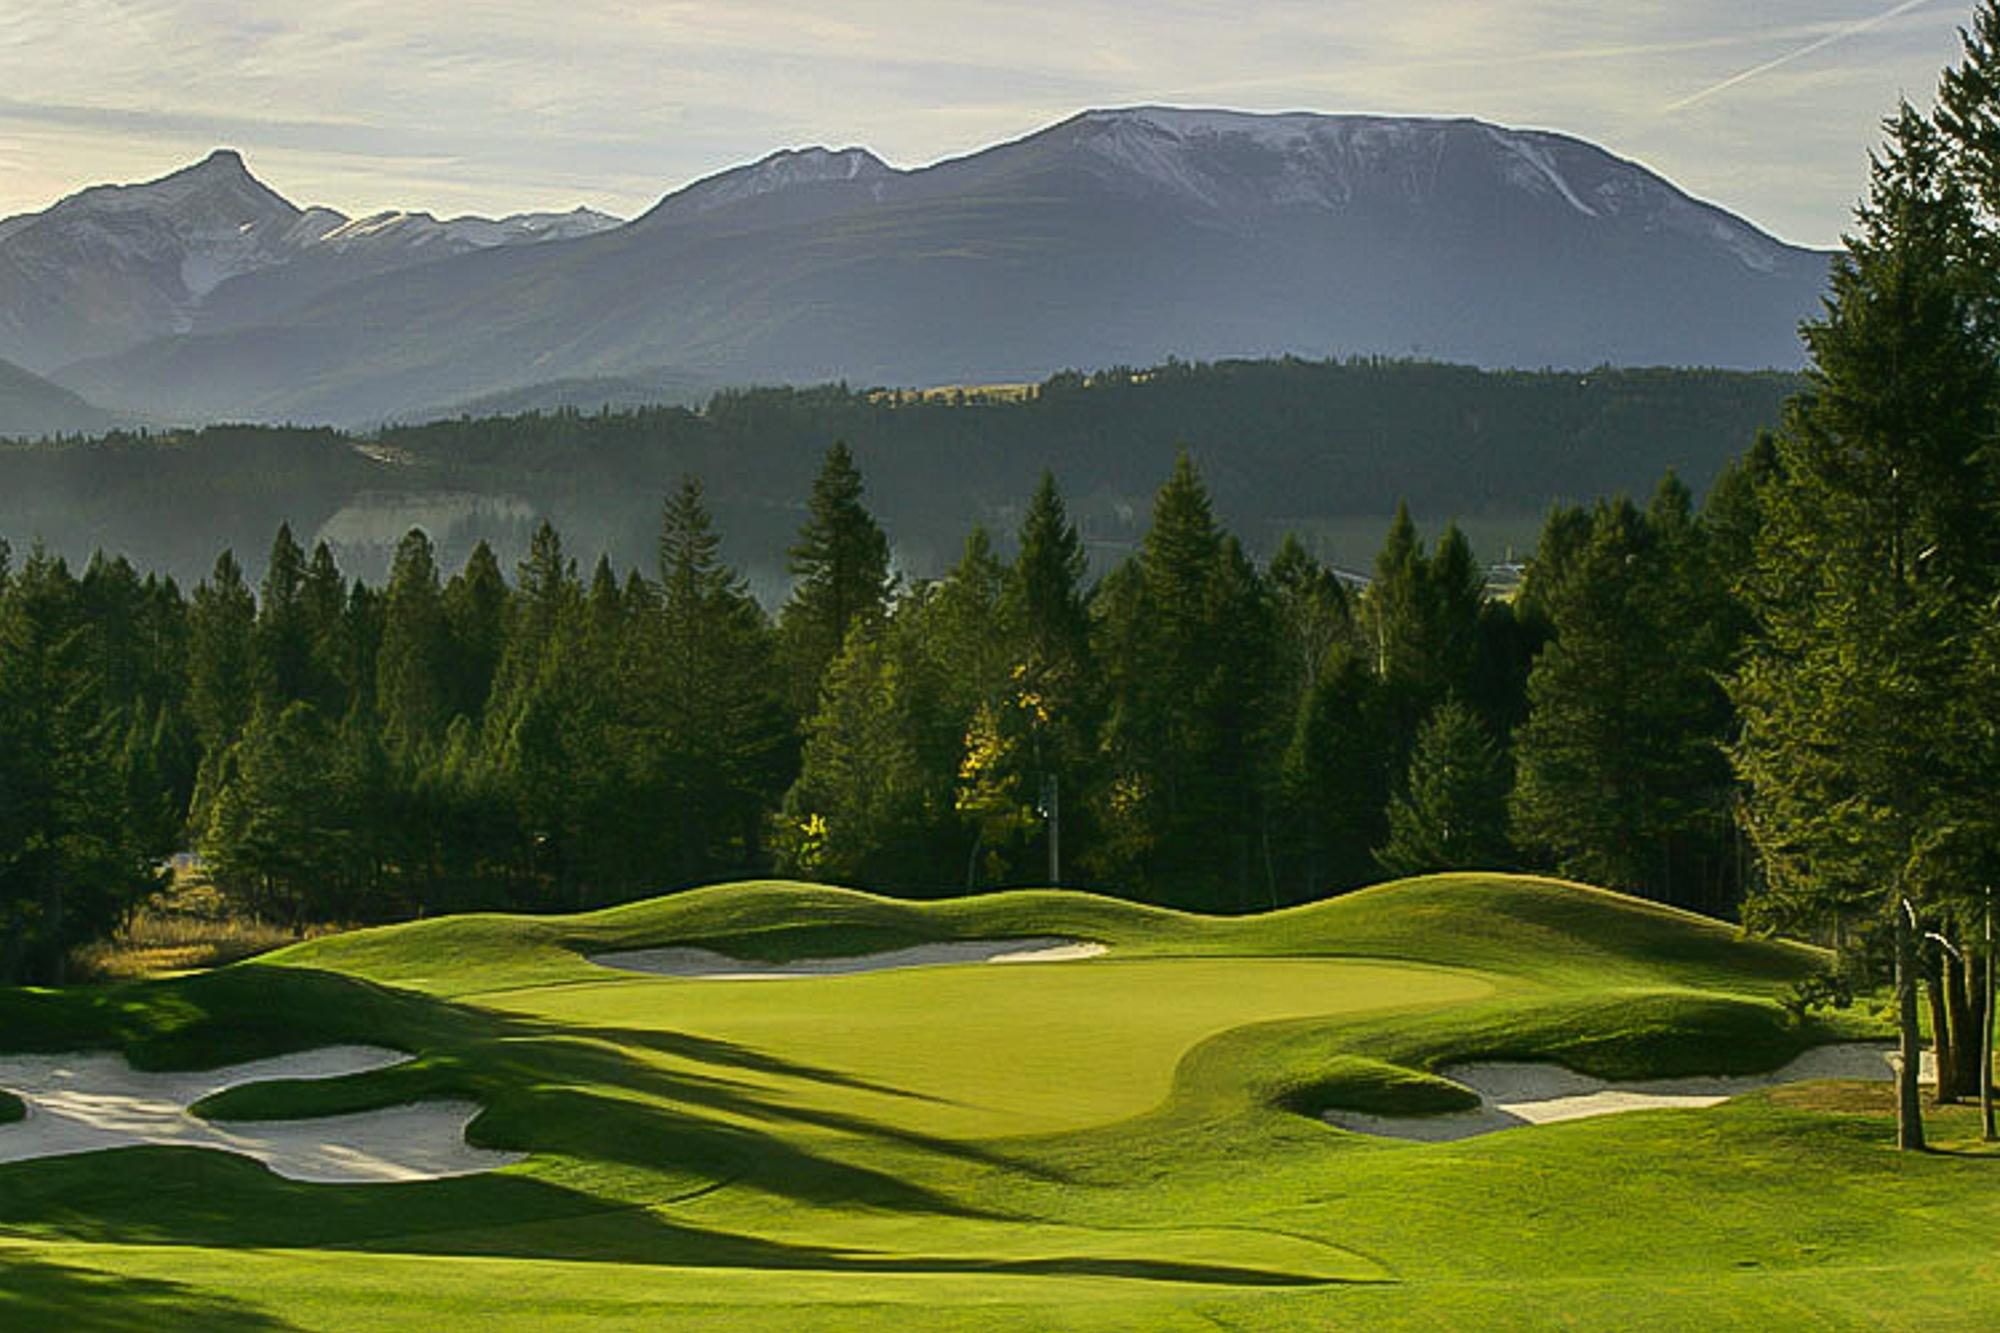 Eagle ranch golf course, invermere bc